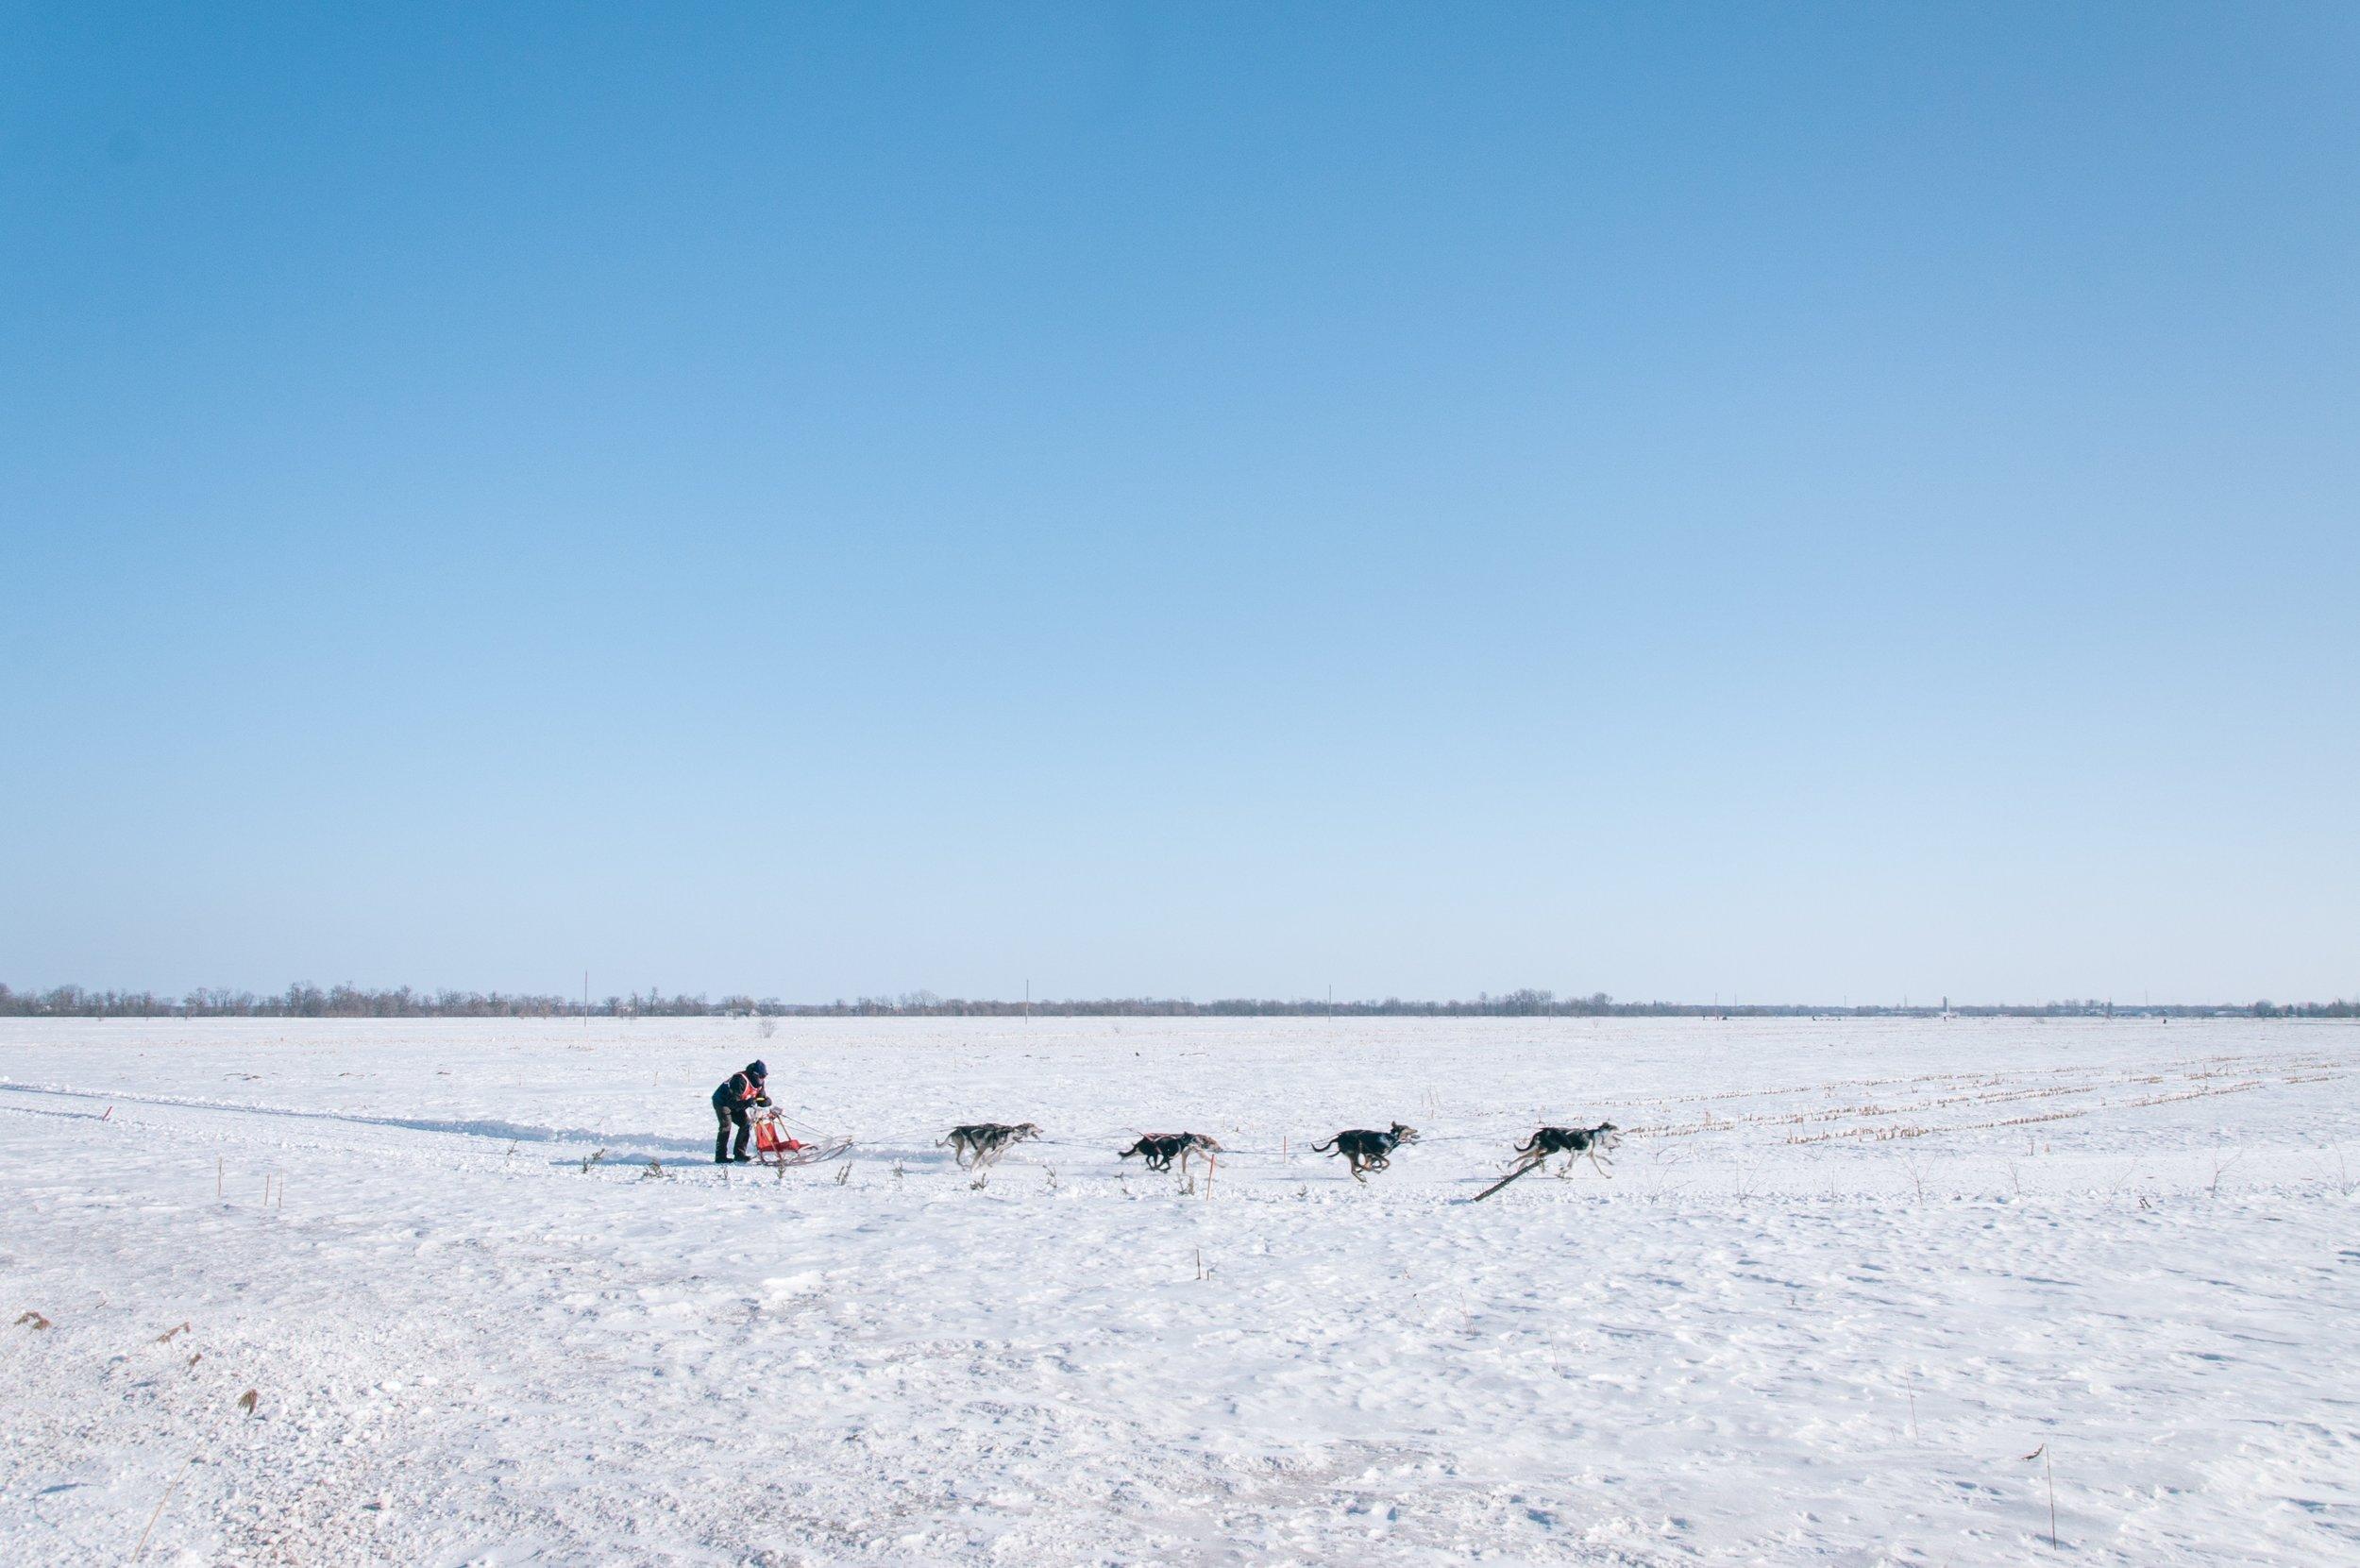 Iditarod Volunteers on The Dapple Dog Lifestyle Site